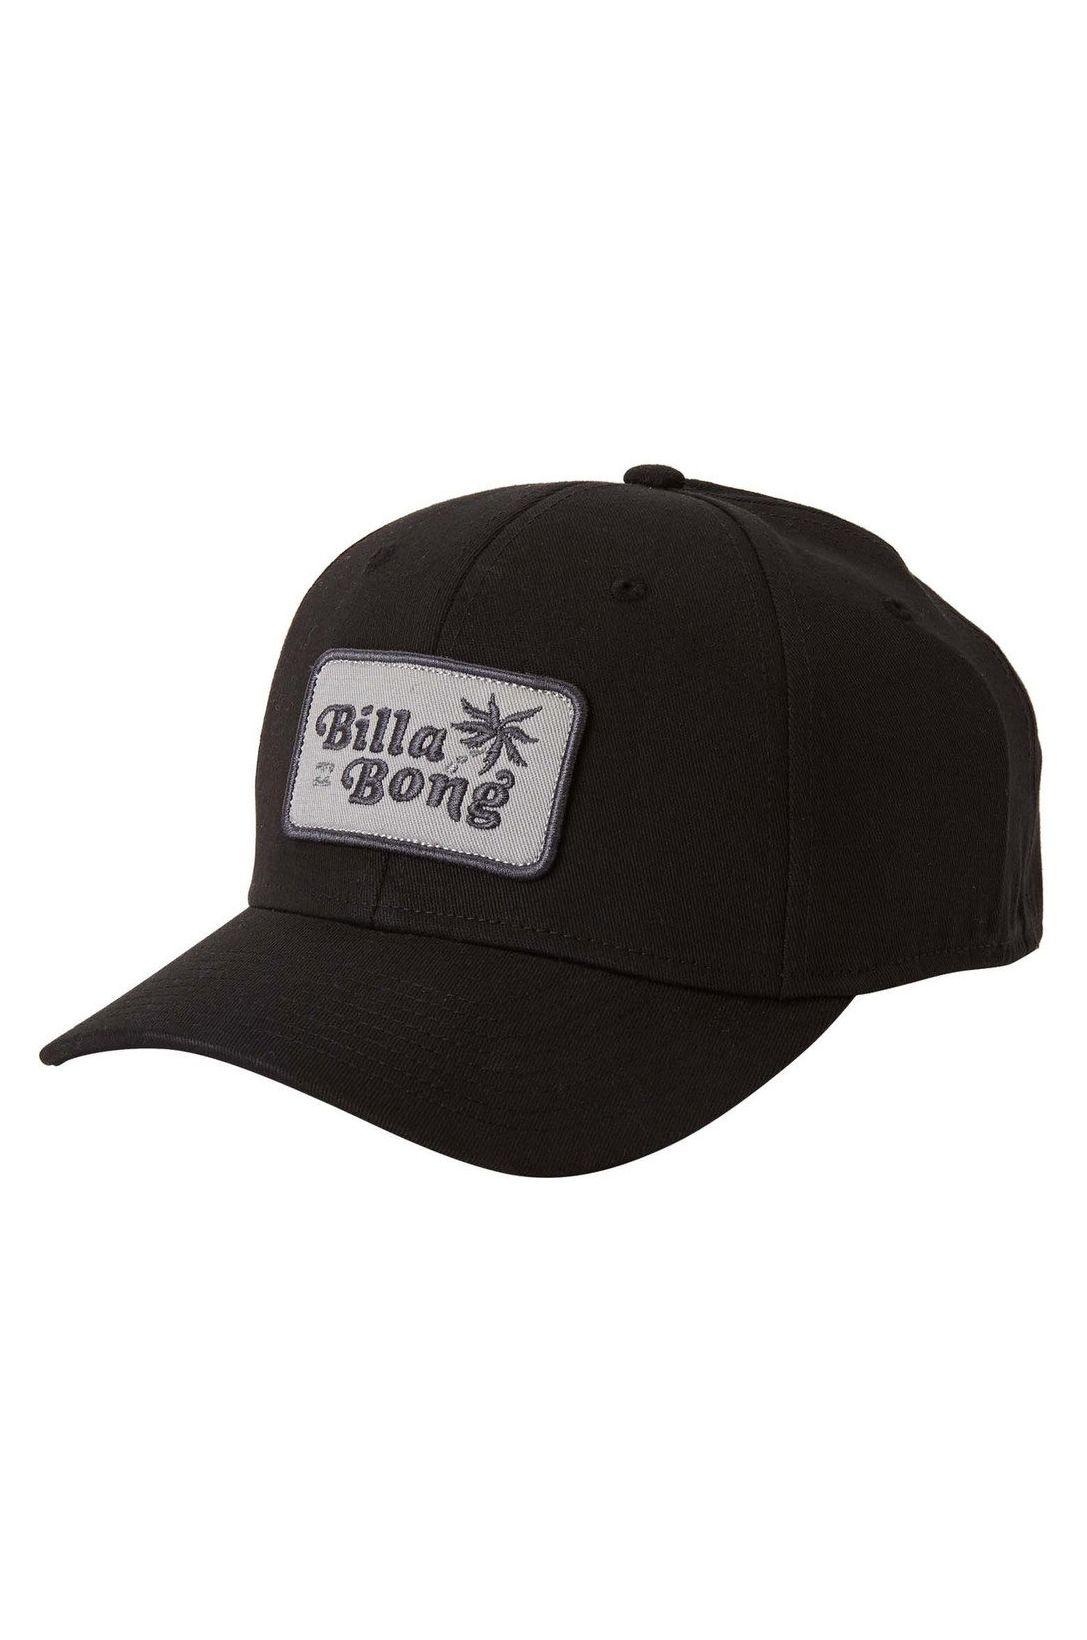 Billabong Cap   WALLED STRETCH Black